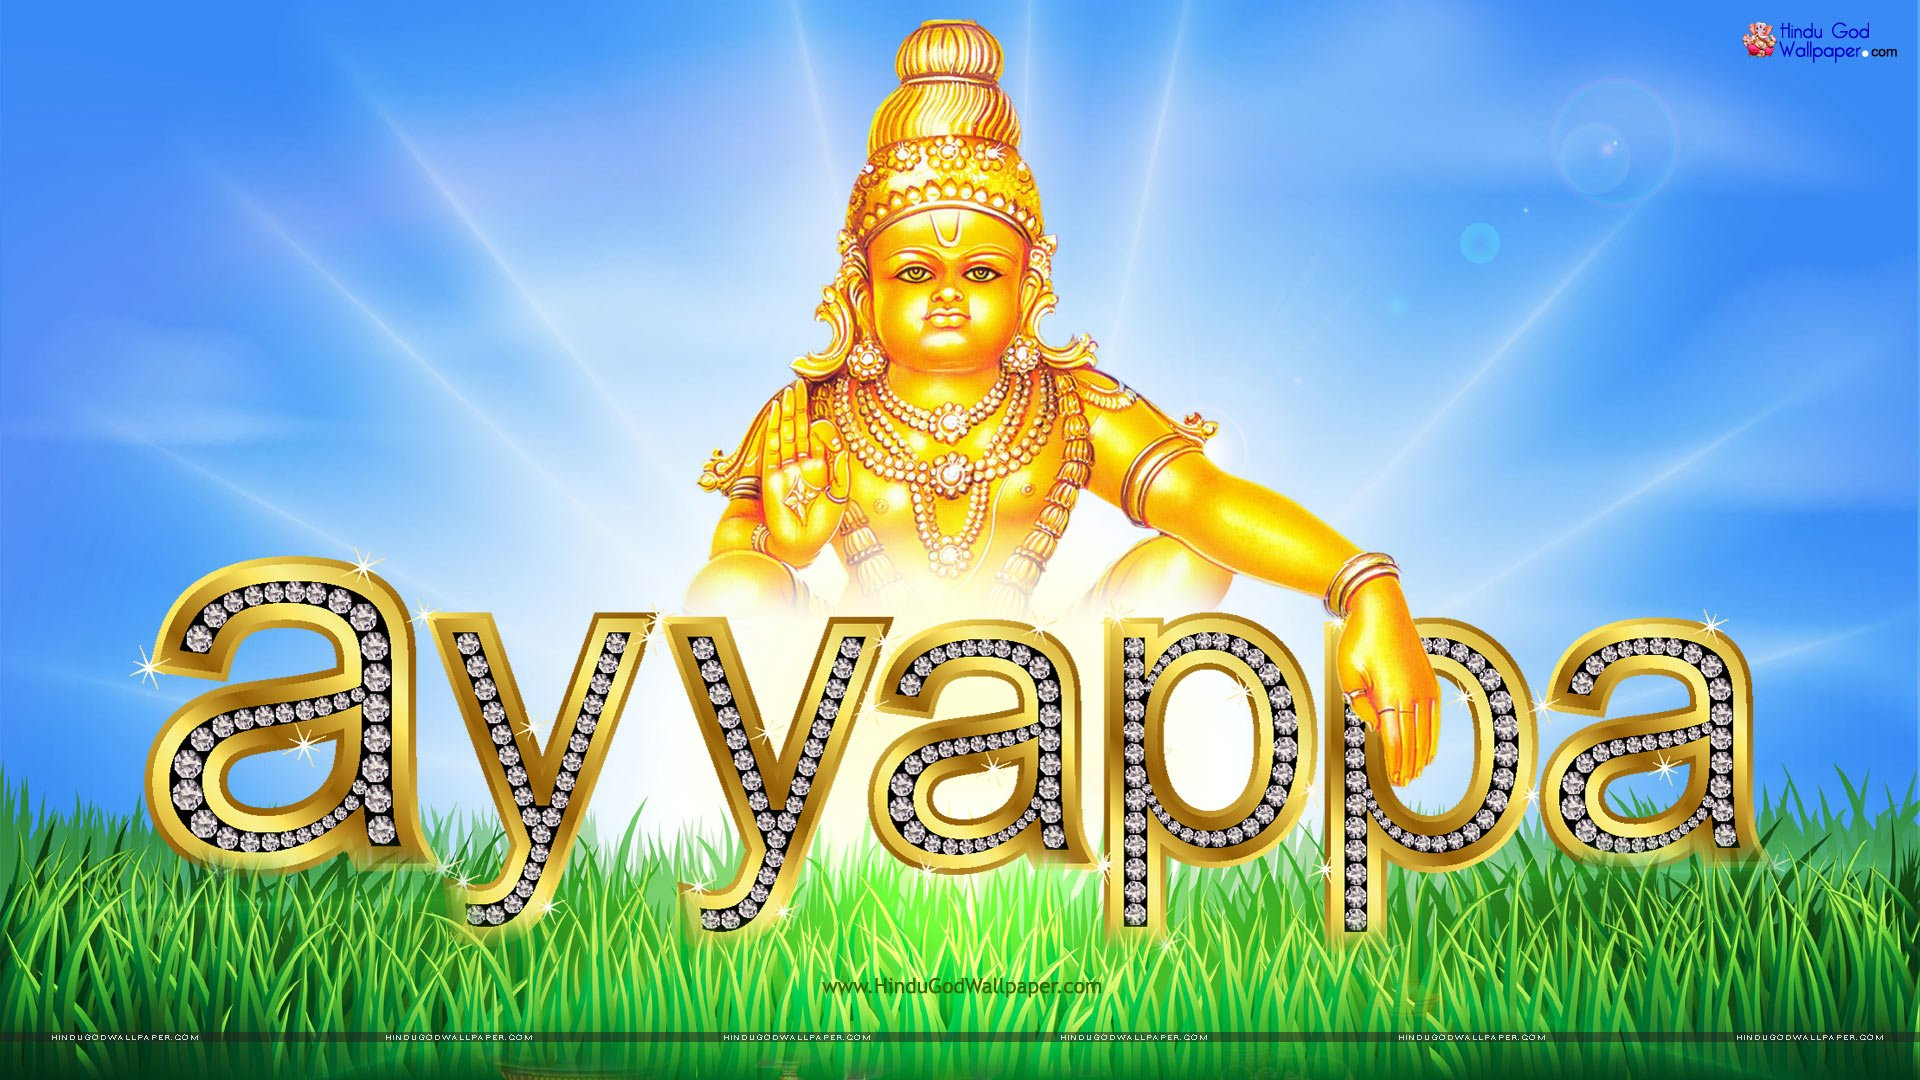 47 hindu god hd wallpapers 1080p on wallpapersafari 47 hindu god hd wallpapers 1080p on